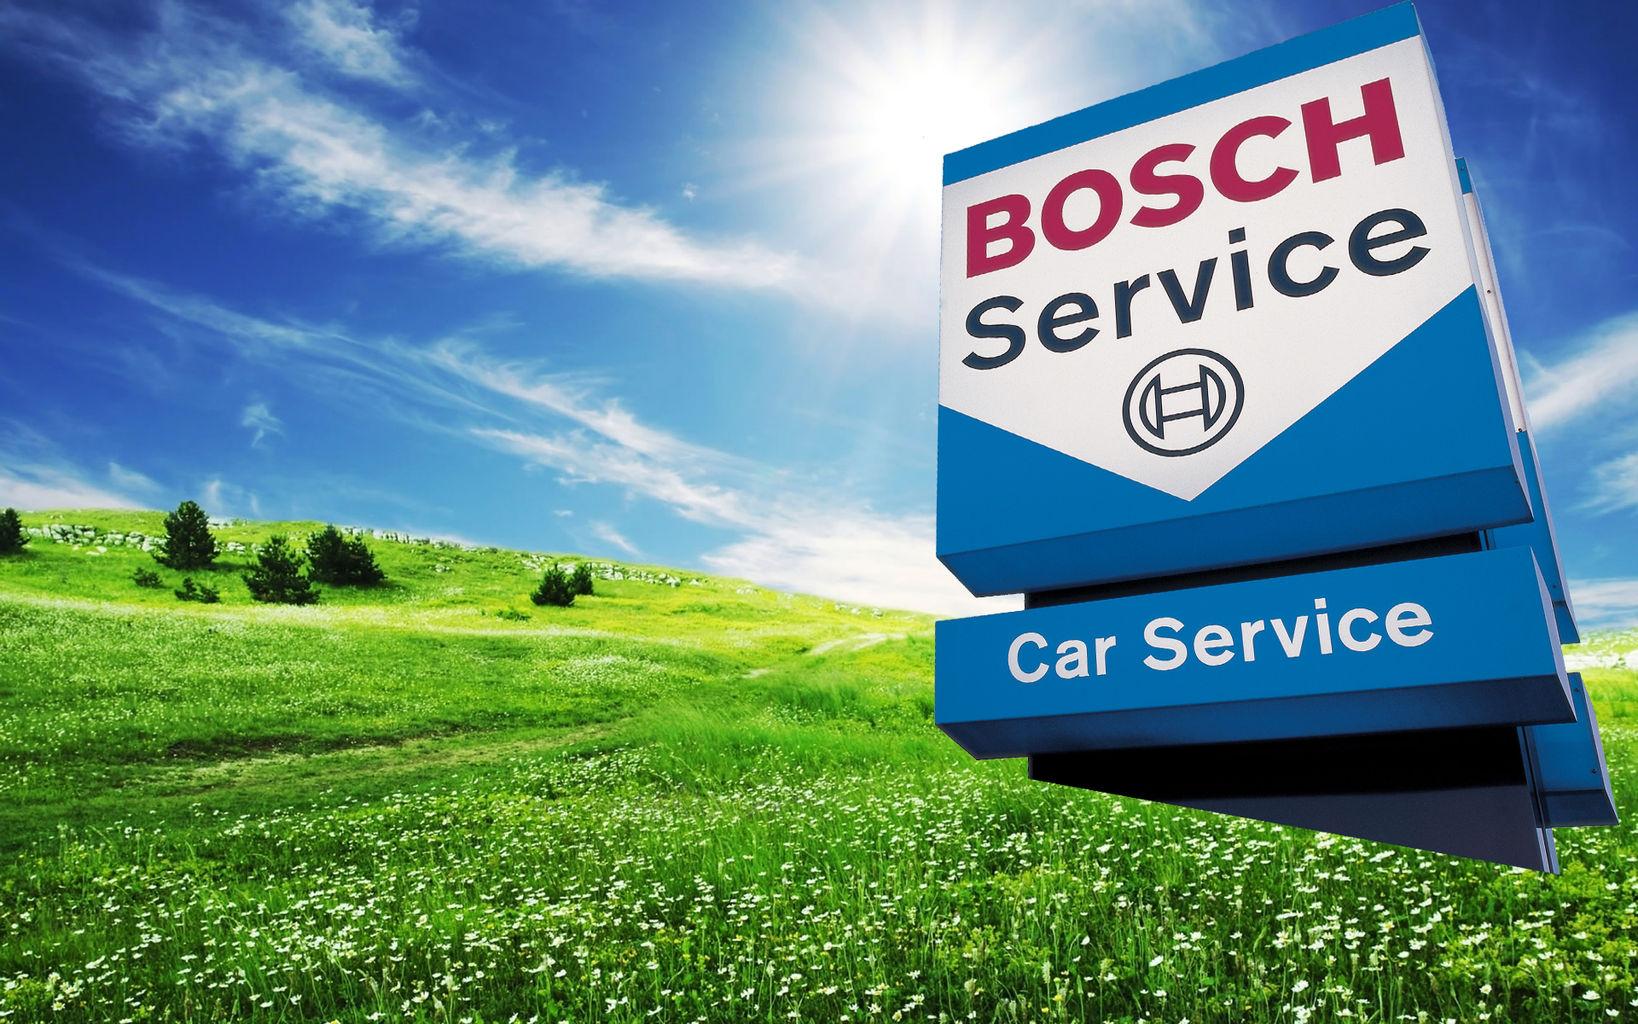 bosch car service nexum. Black Bedroom Furniture Sets. Home Design Ideas